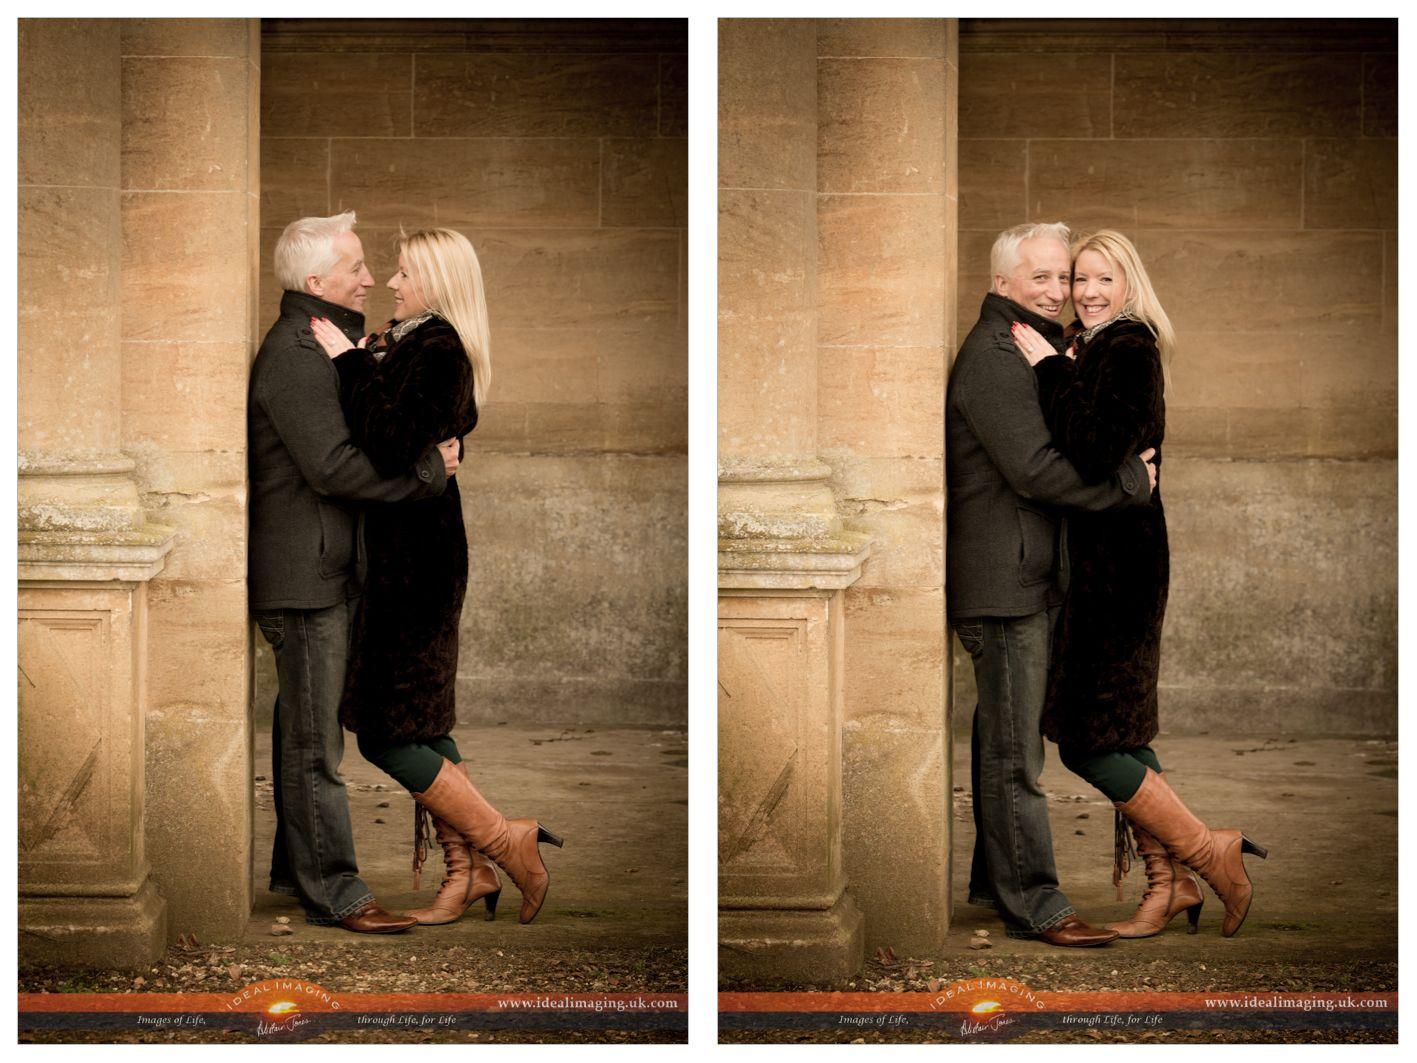 Tylney Hall Hotel Lifestyle Portraits and Wedding Photographer: Sarah & Alan - Alistair Jones